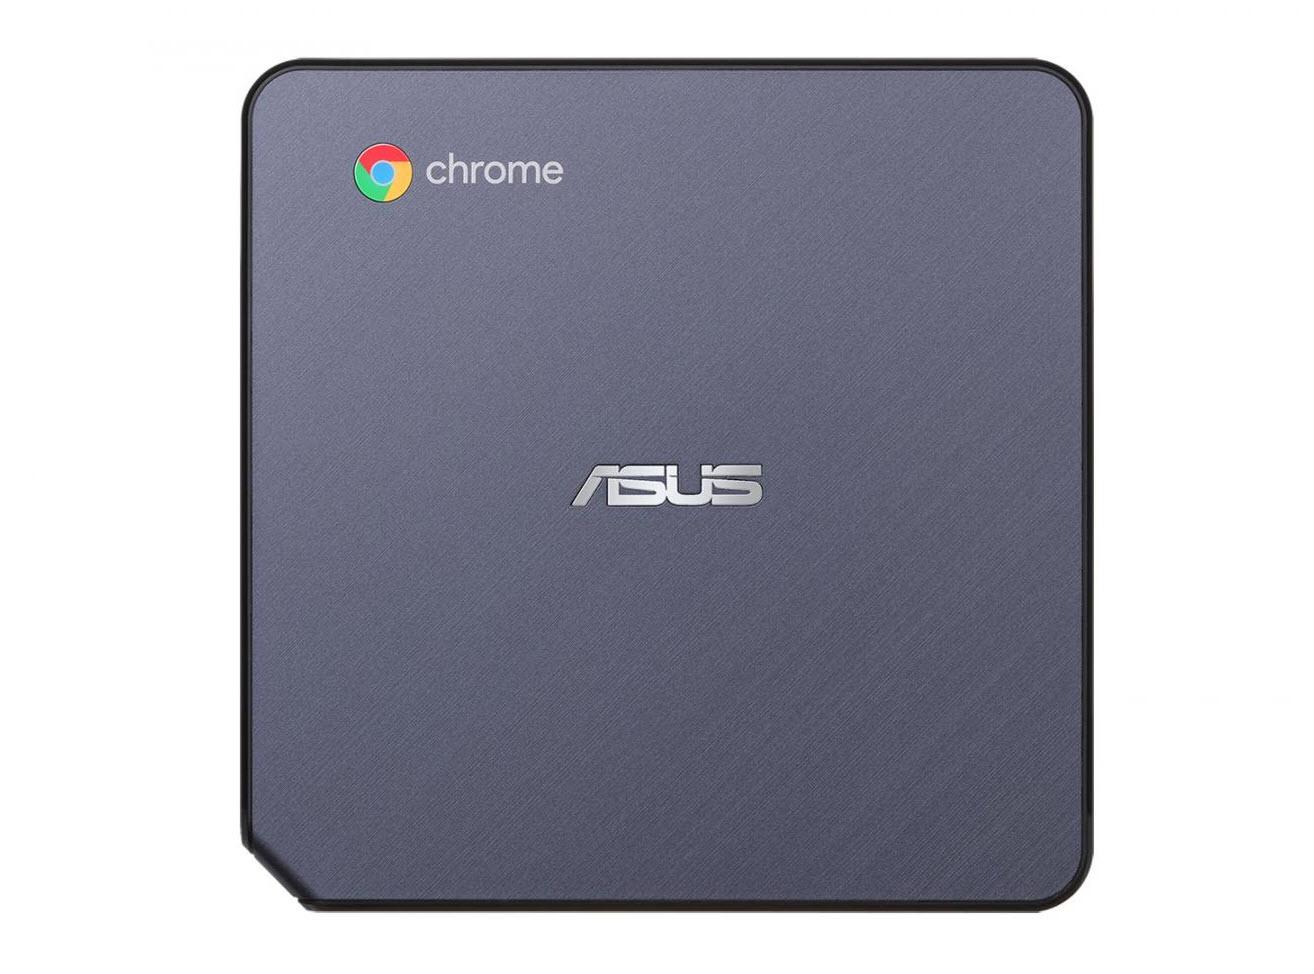 2018 05 27 8 17 33 ASUS เปิดตัว ASUS Chromebox 3 ซีรี่ย์ mini PC รุ่นใหม่ล่าสุด